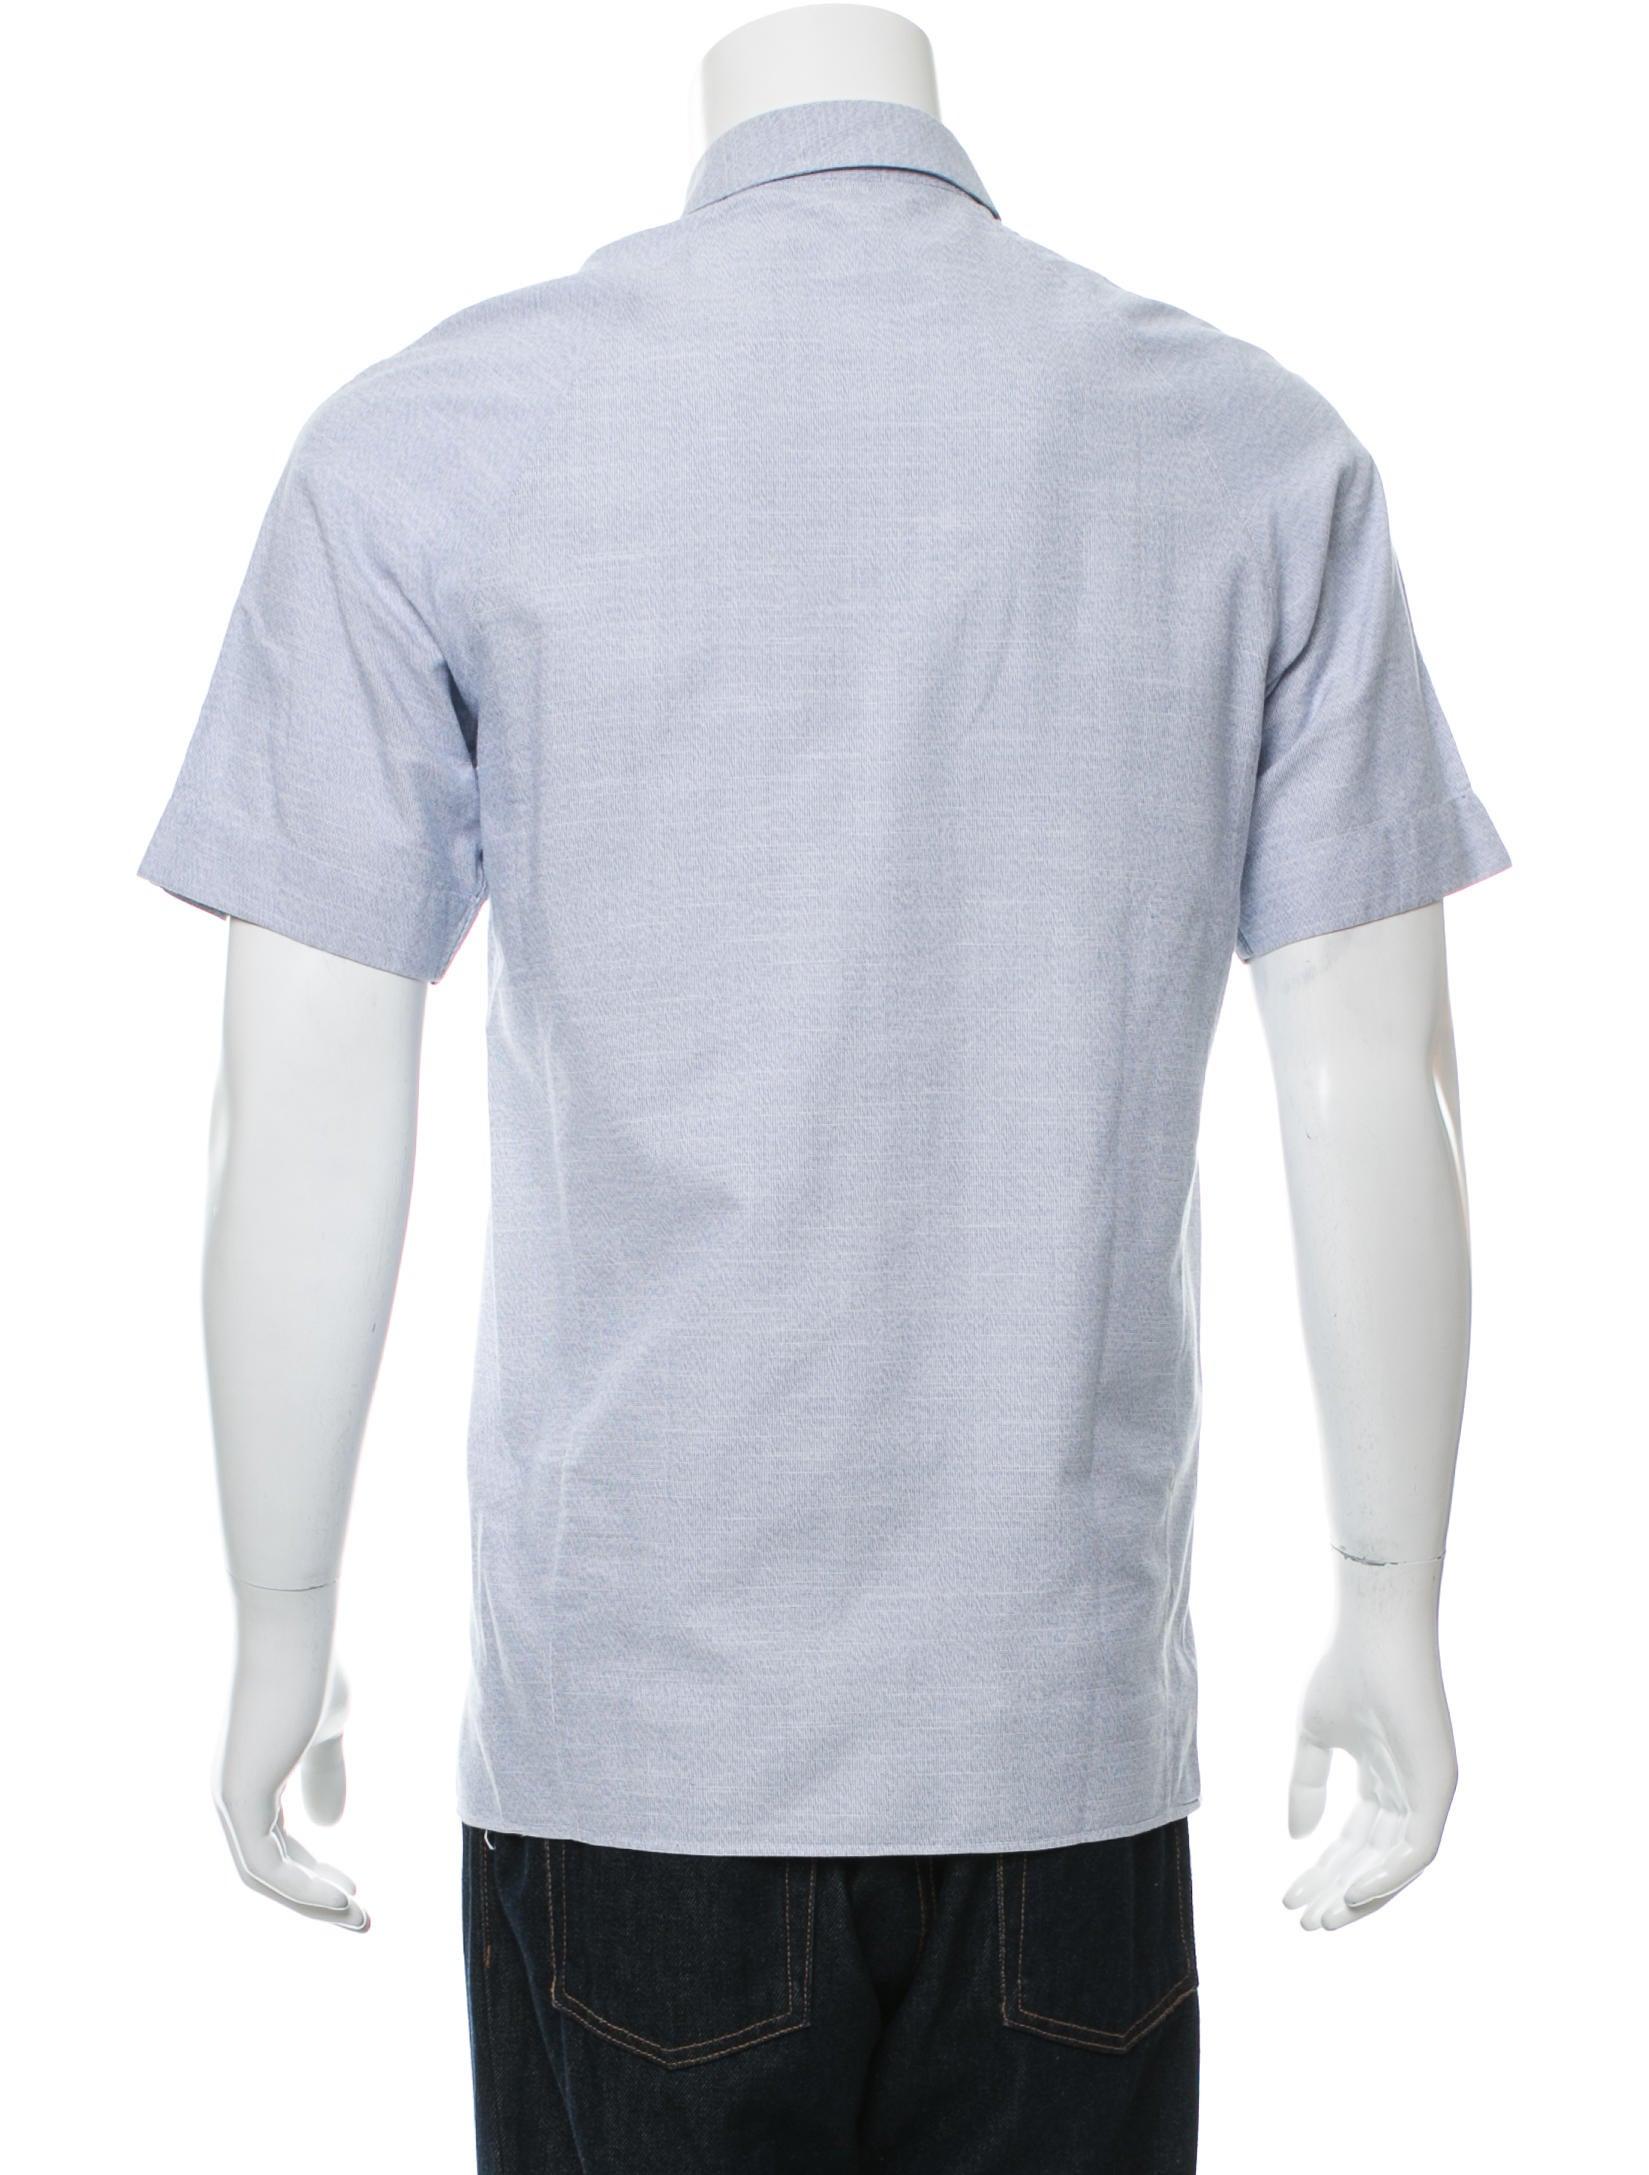 Jil sander short sleeve button up shirt clothing for Jil sander mens shirt